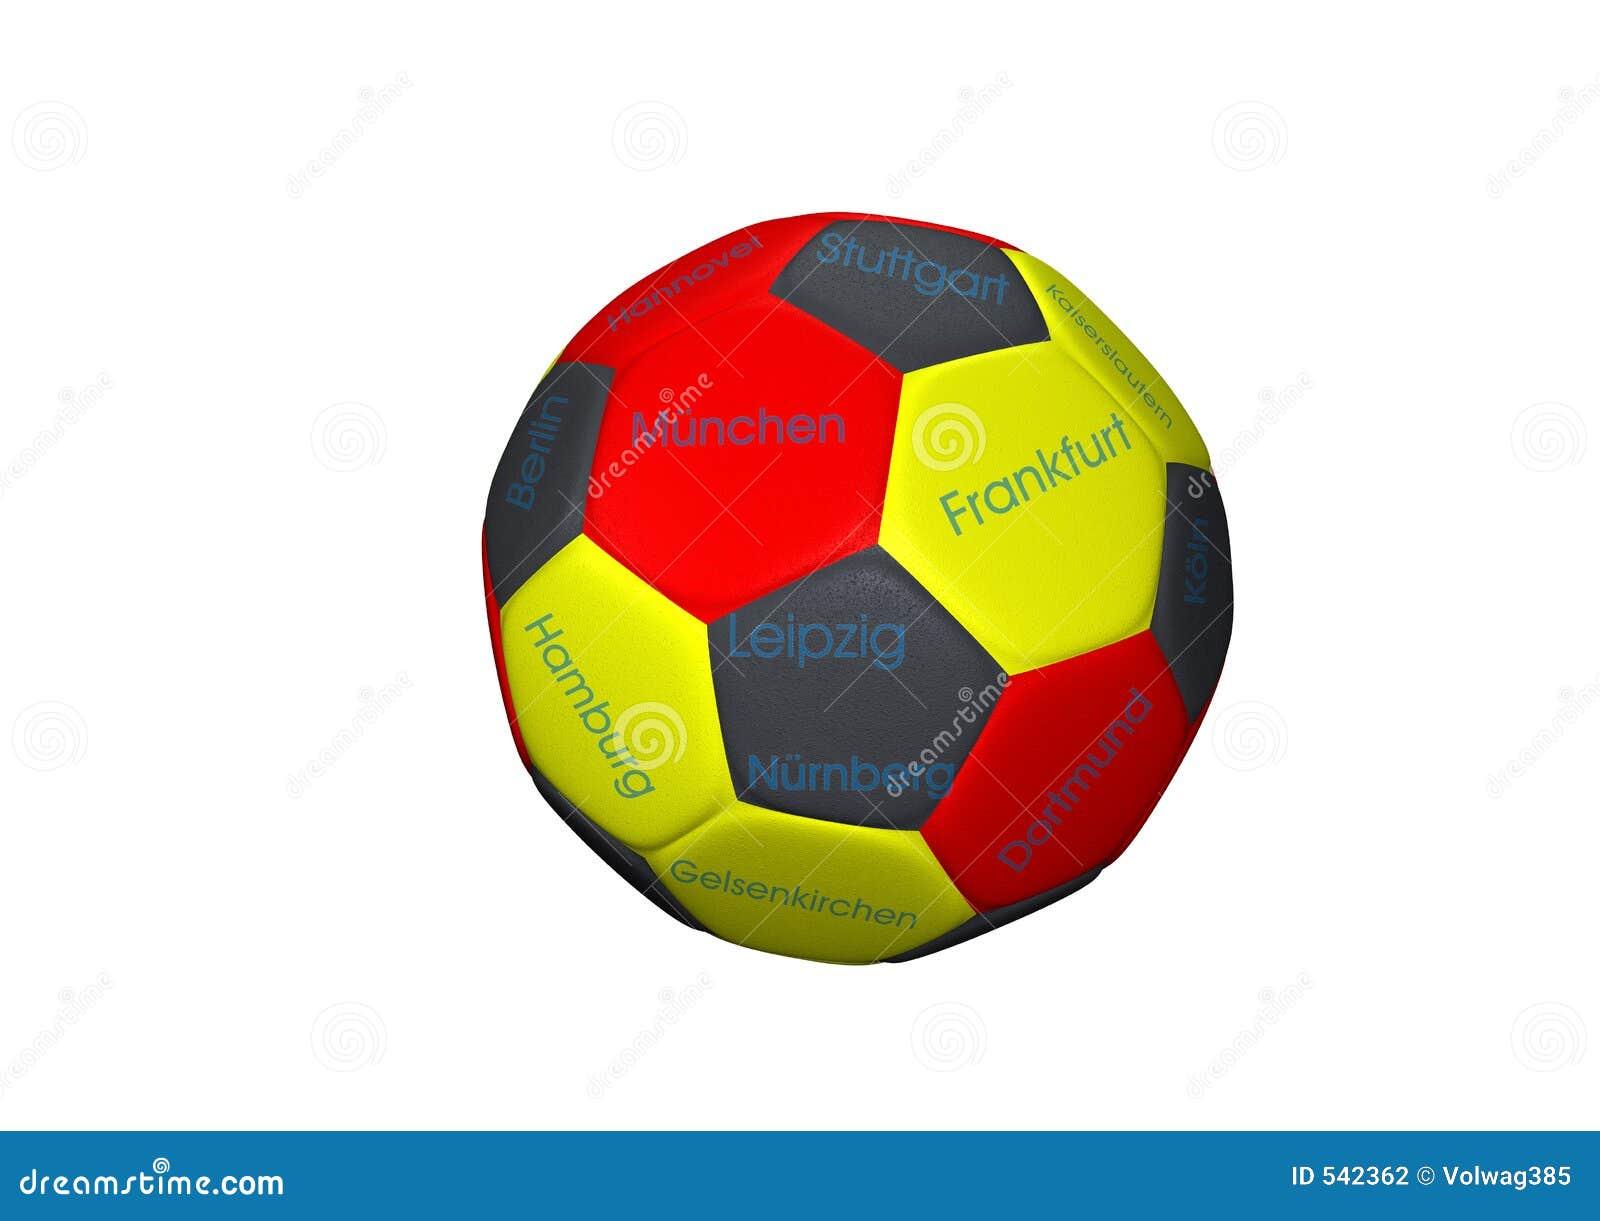 Download 球足球 库存例证. 插画 包括有 德国, 足球, 例证, 回报, 作用, 零件, 竹子, 红色, 黄色 - 542362